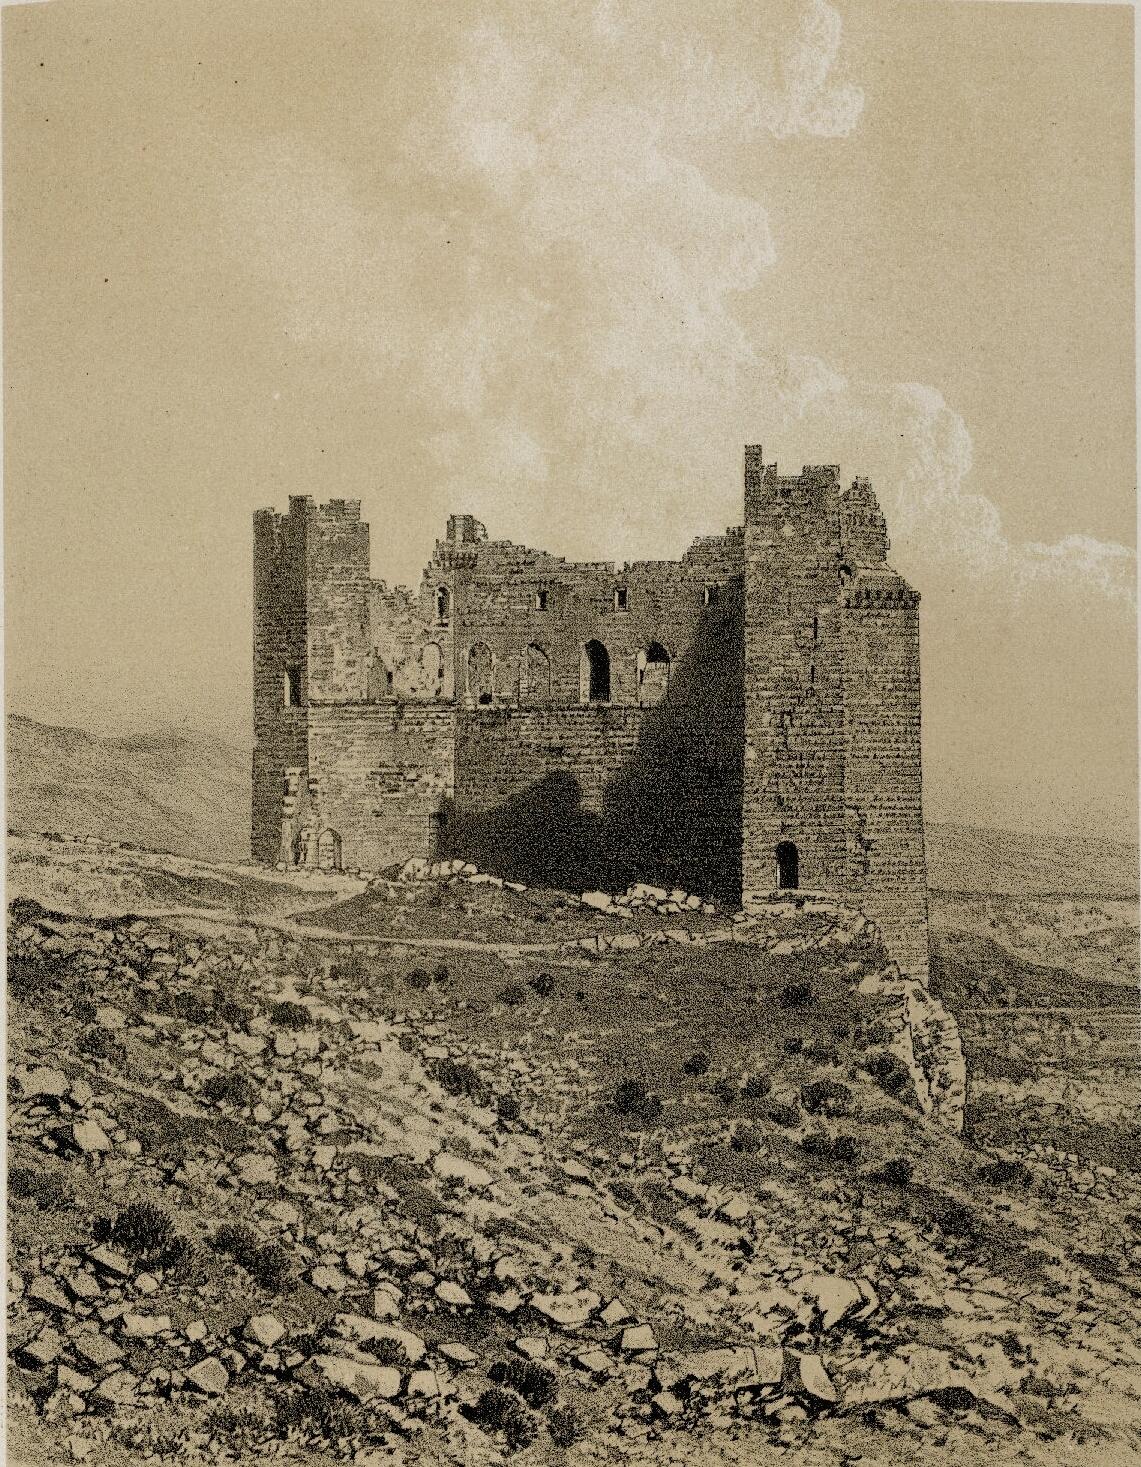 65. Эль-Карак. Башня Малк-эд-Дахер, вид внутри